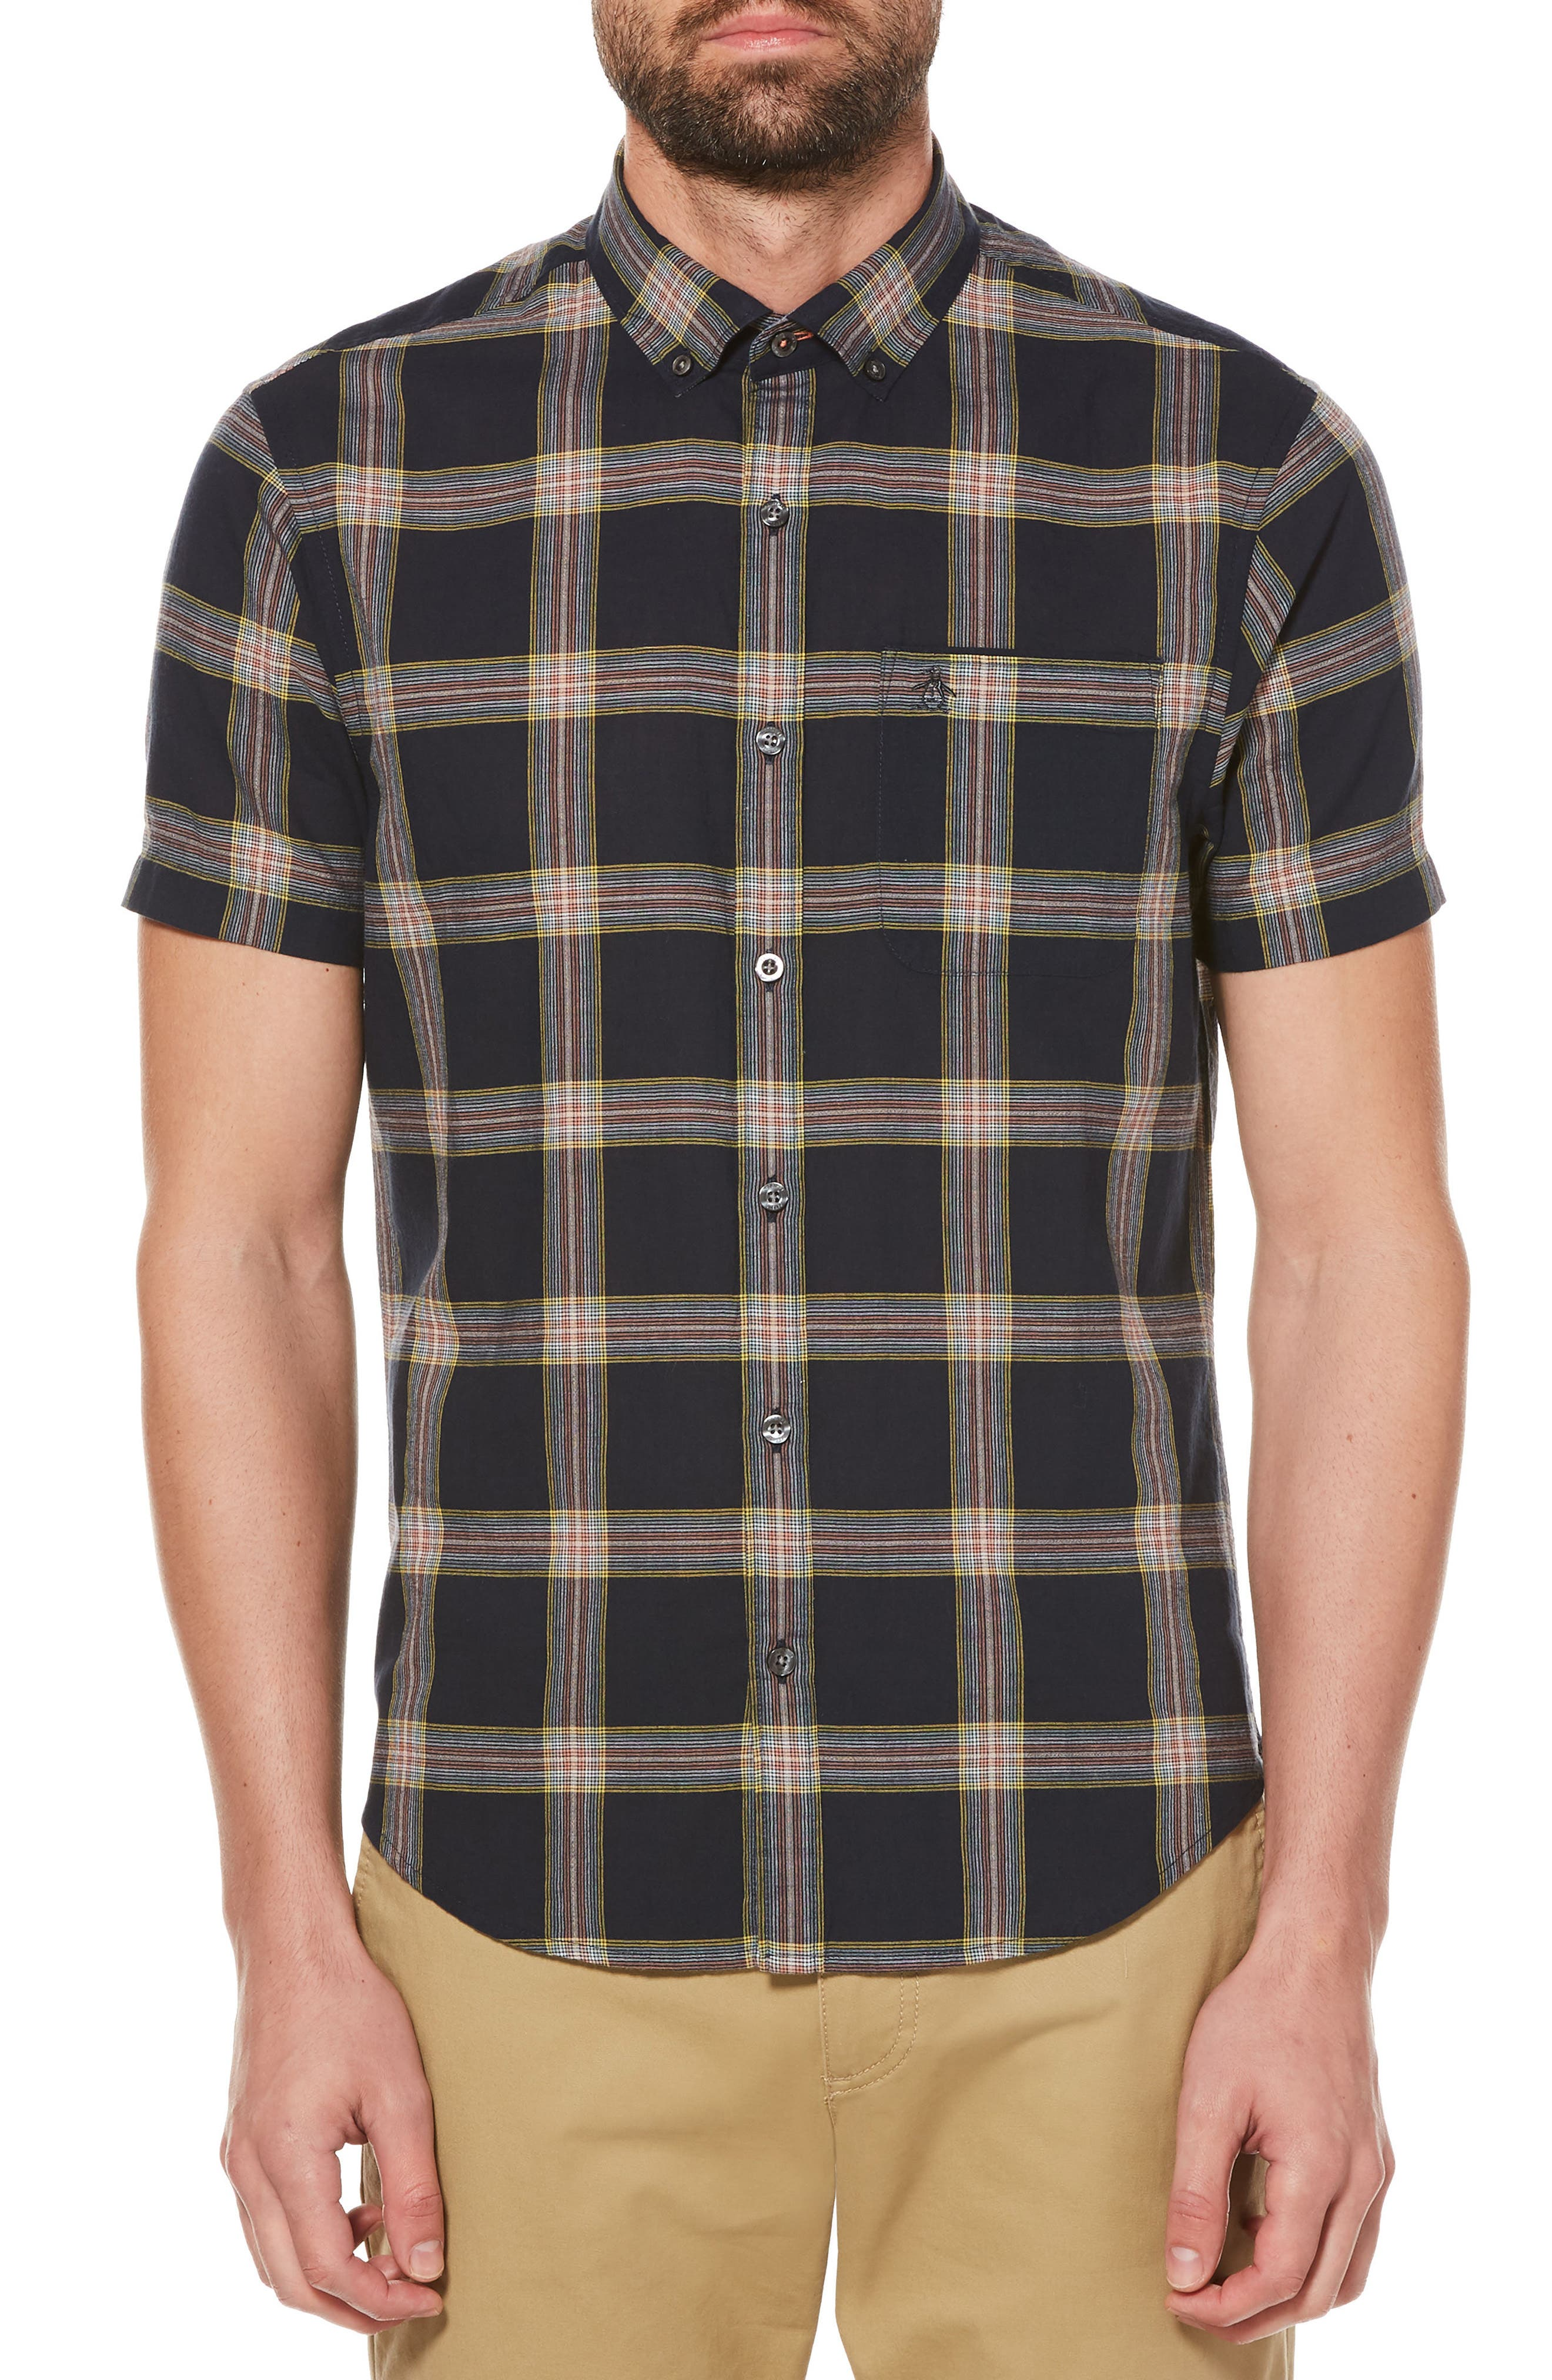 Main Image - Original Penguin Textured Lawn Plaid Shirt